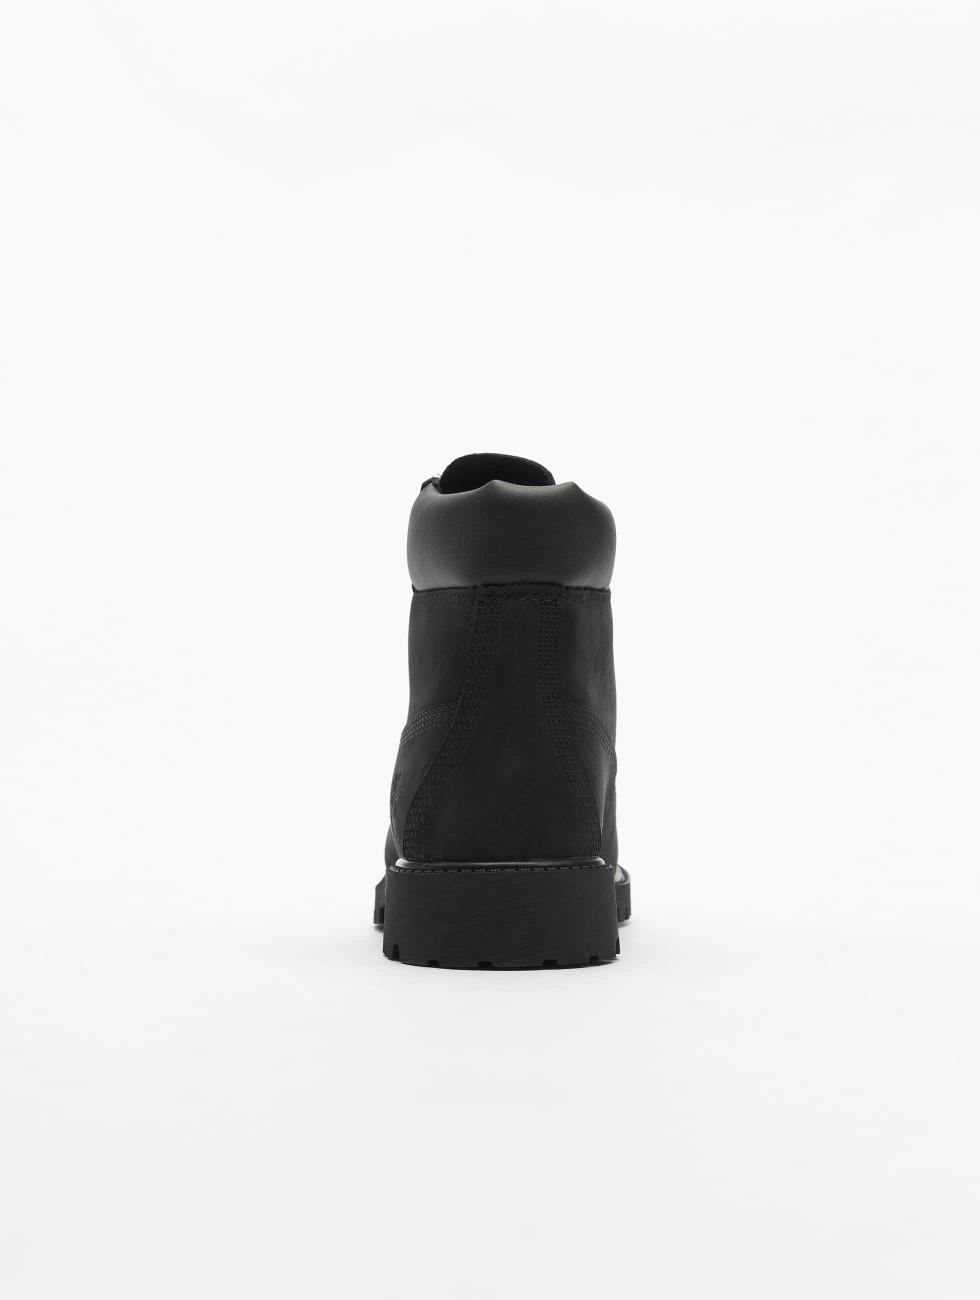 Timberland Scarpa / Stivali 6 In Premium Impermeabile Nero 367 653 Gq7DRkzQD